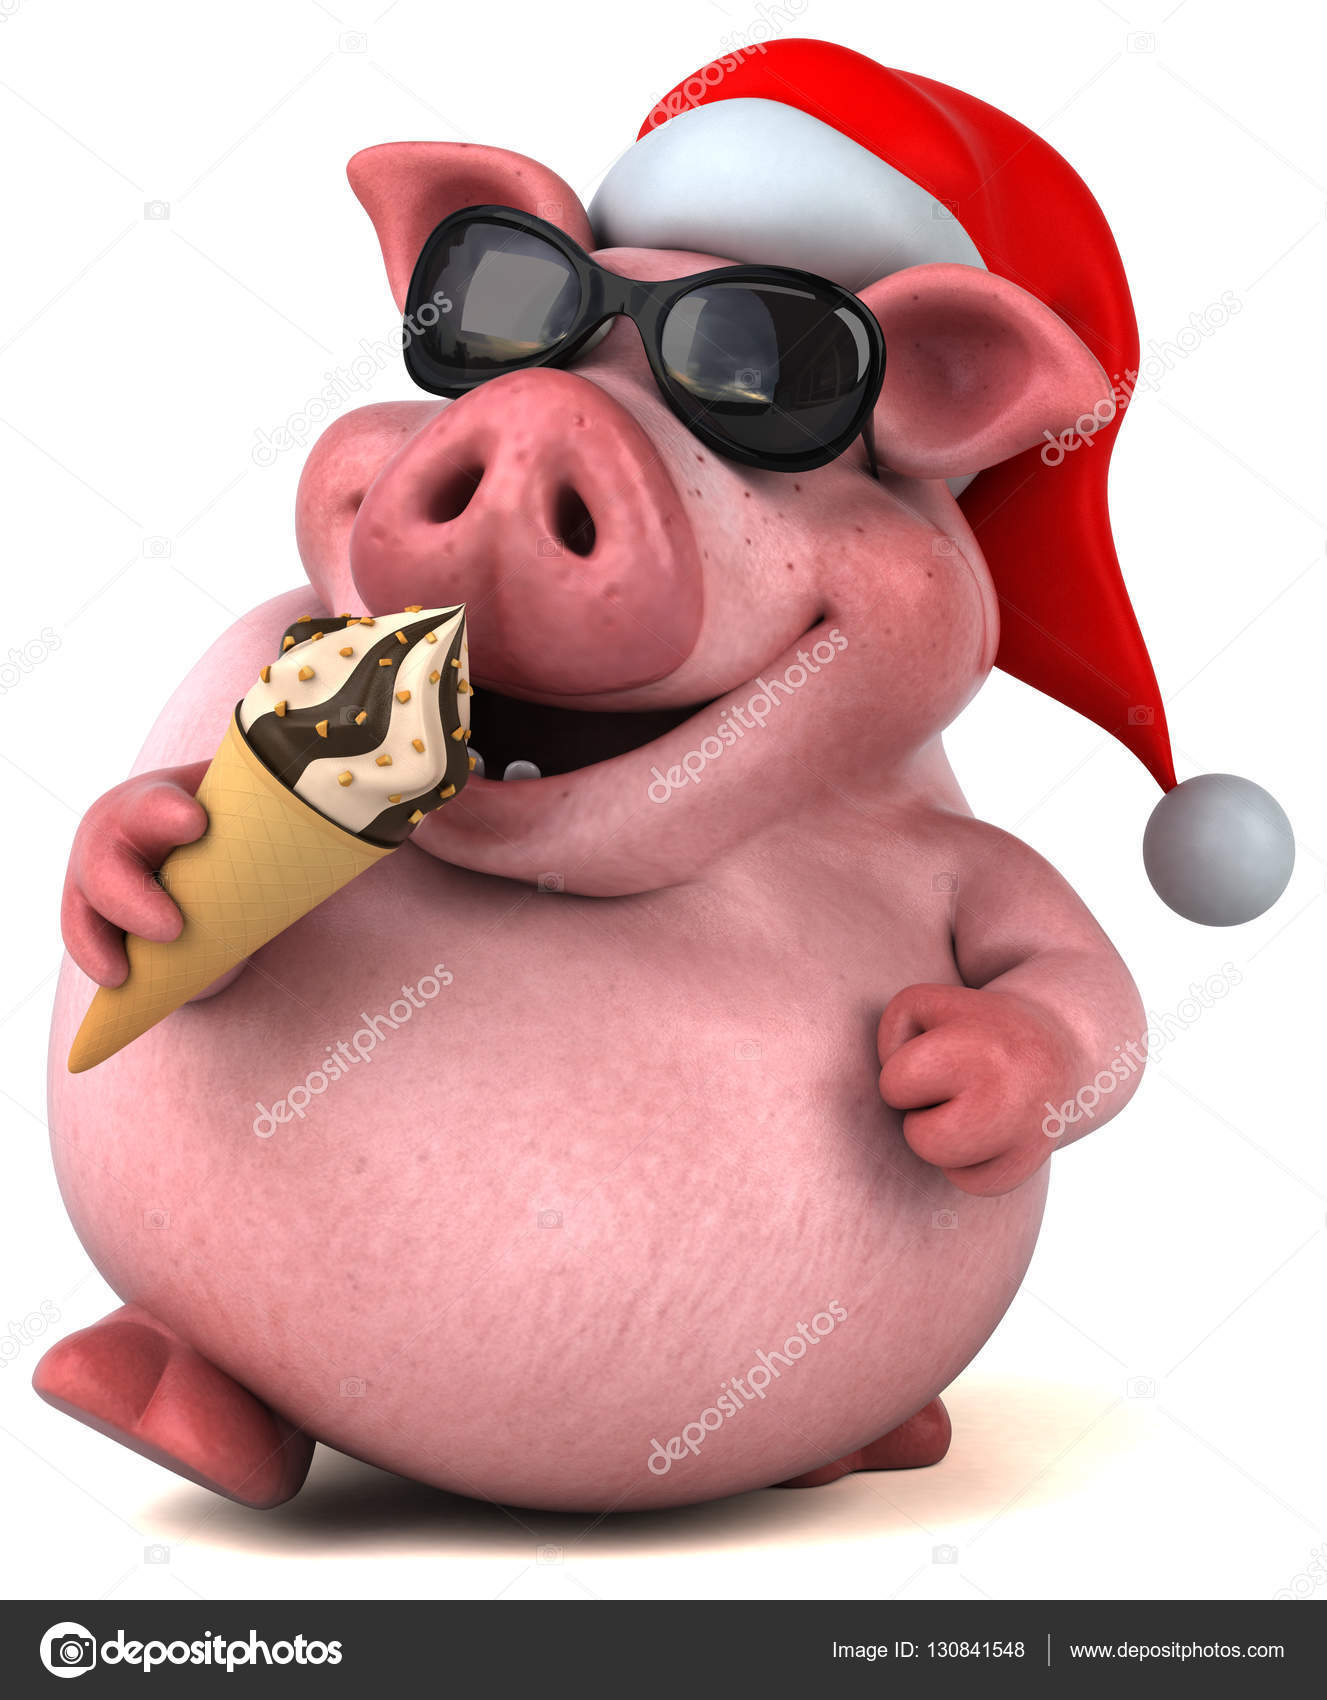 Рисунки карандашом, открытка со свиньей 3д